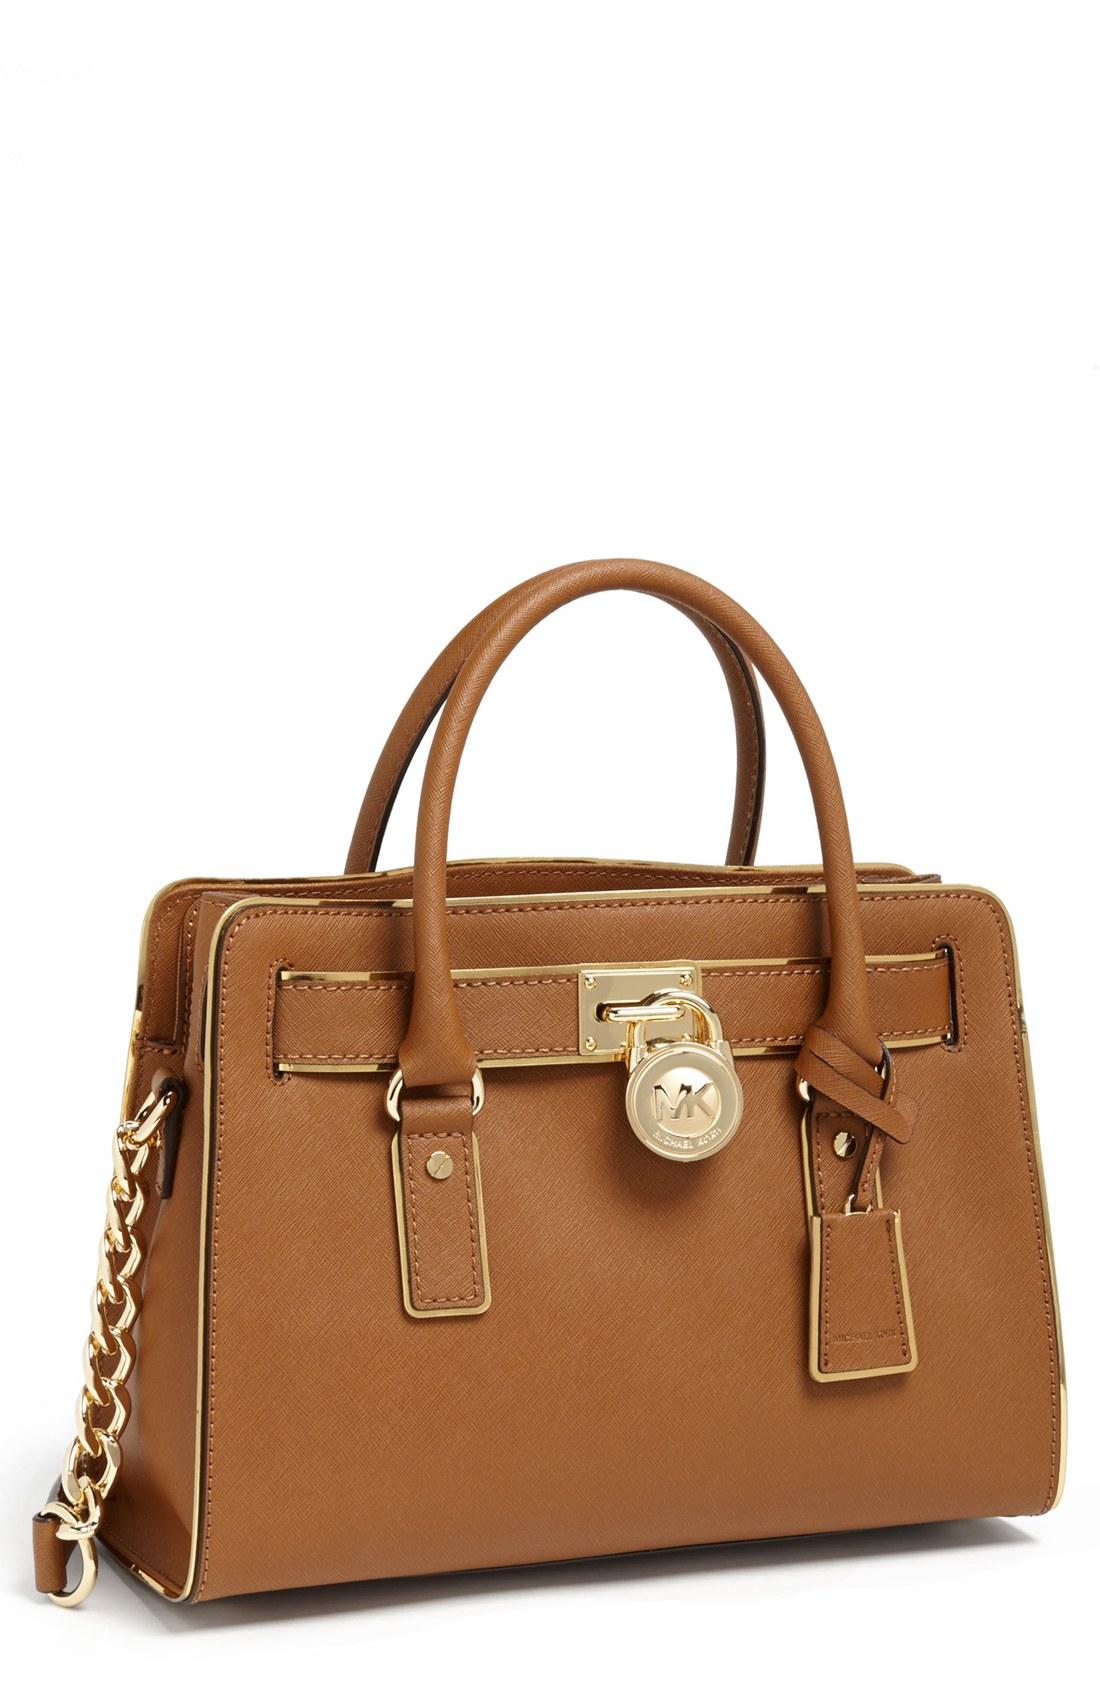 michael michael kors hamilton leather satchel in brown. Black Bedroom Furniture Sets. Home Design Ideas